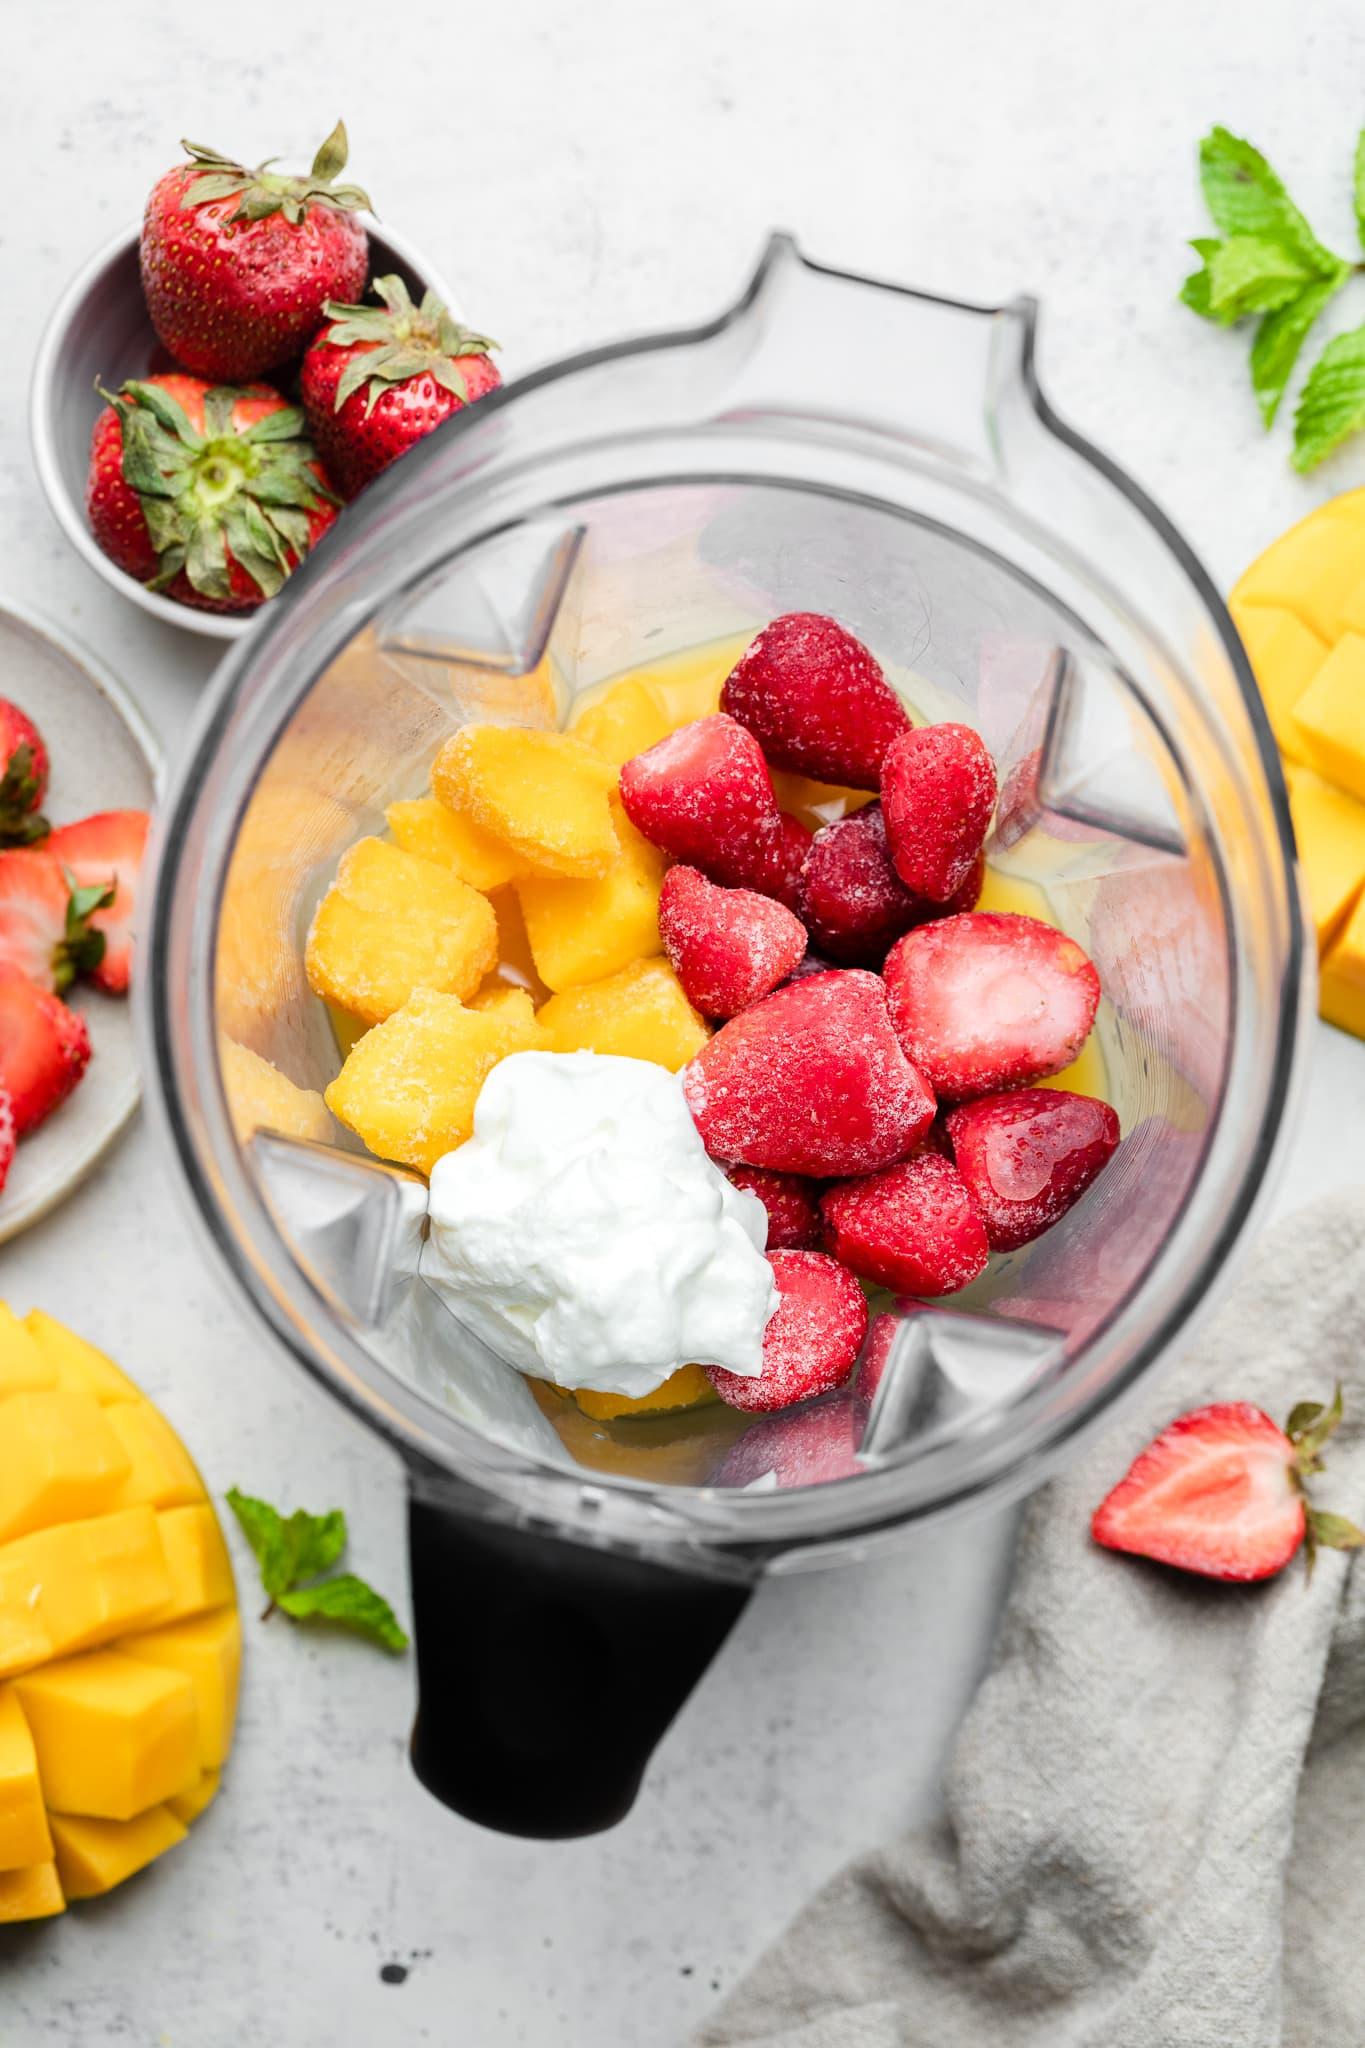 strawberry mango smoothie ingredients in a blender